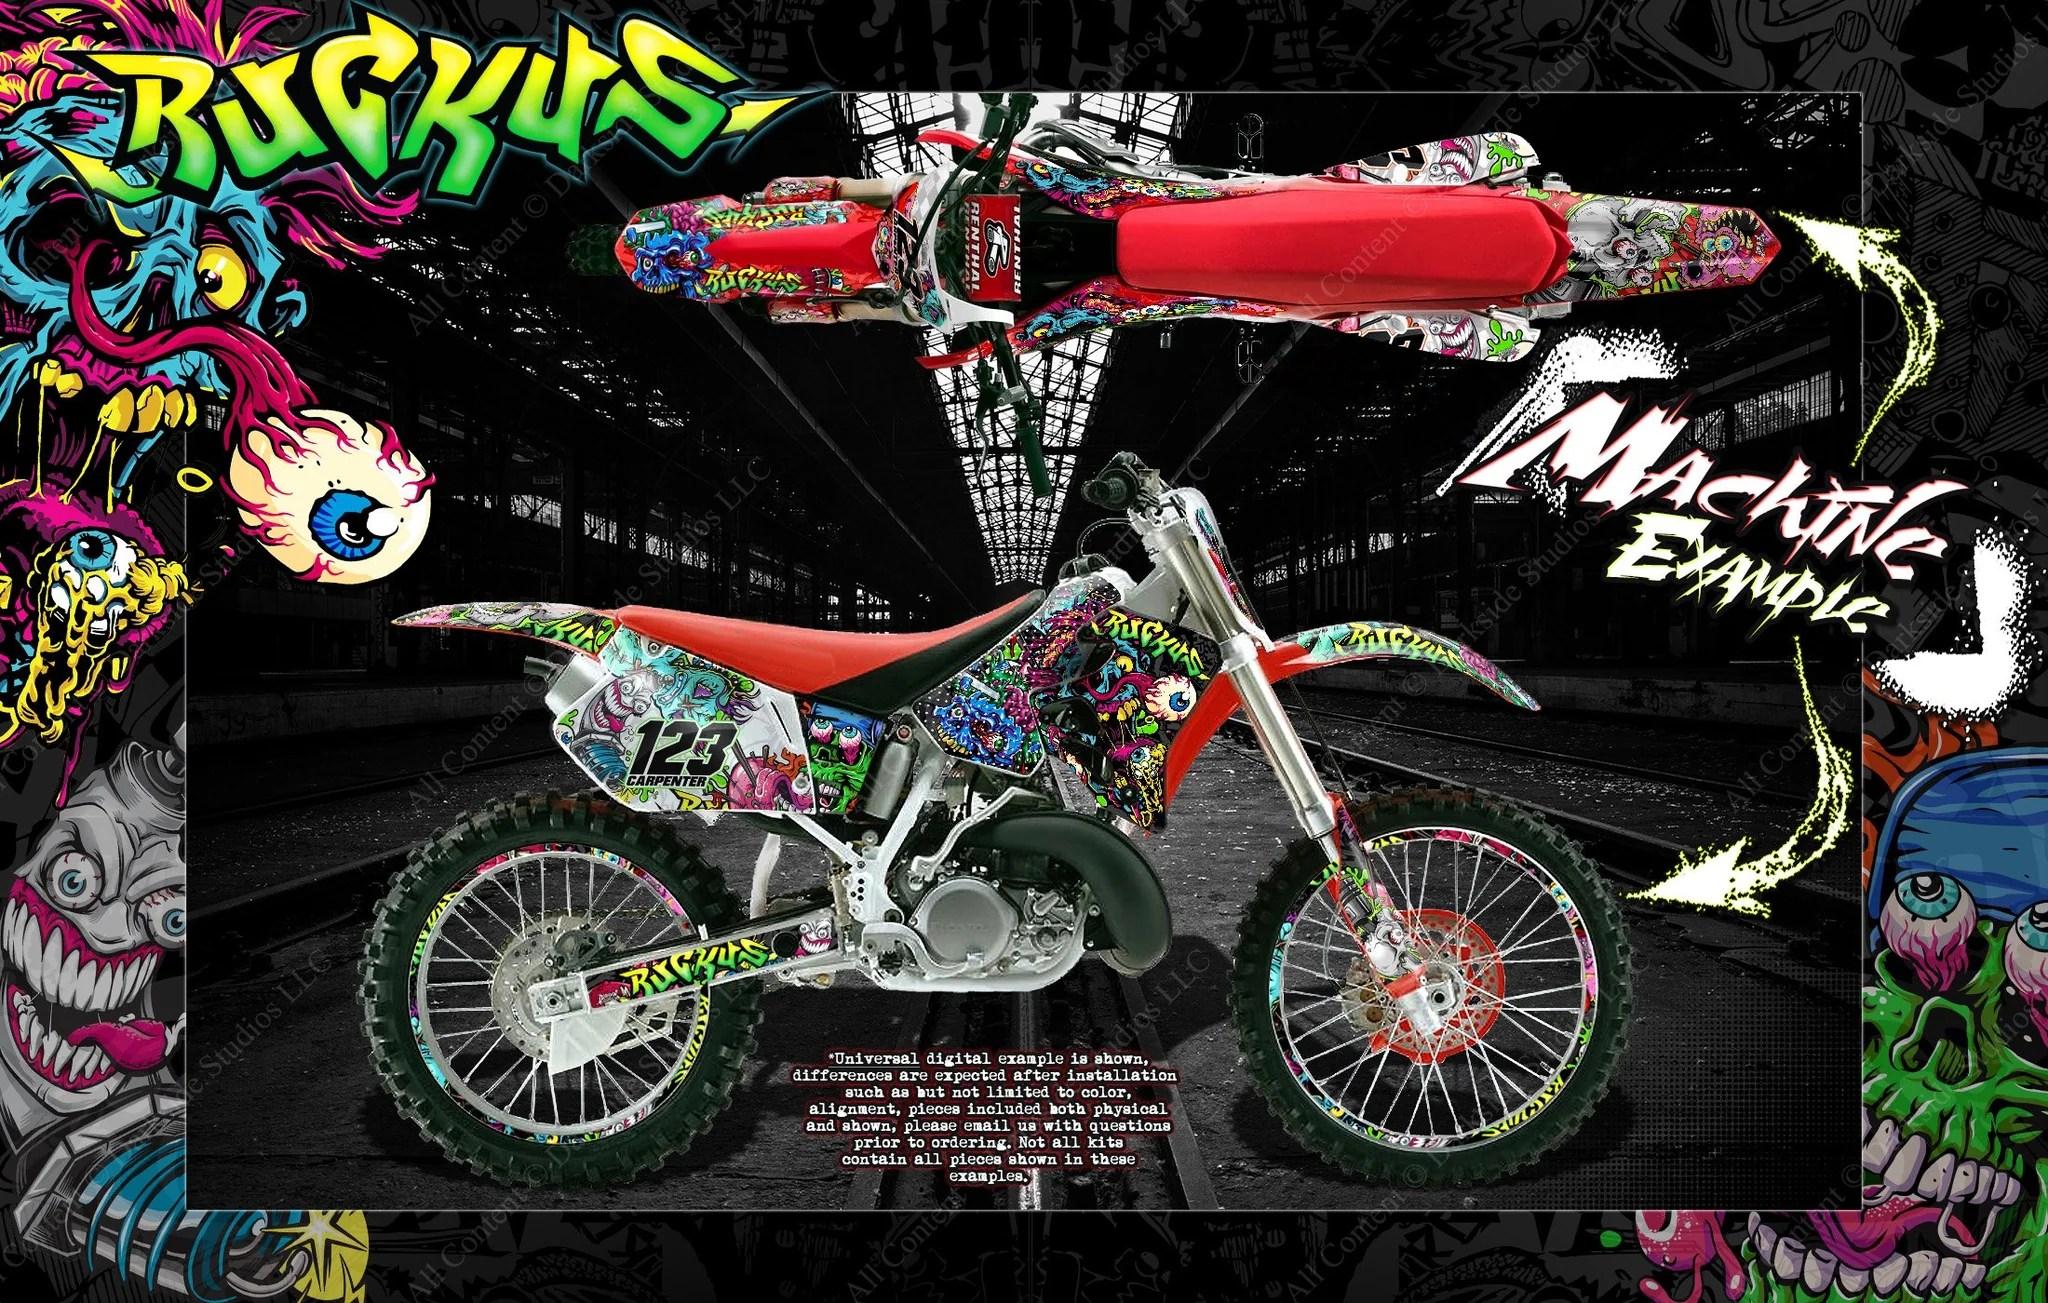 honda 1988 1999 cr125 cr250 graphics wrap ruckus decal kit with rim graphics [ 2048 x 1303 Pixel ]